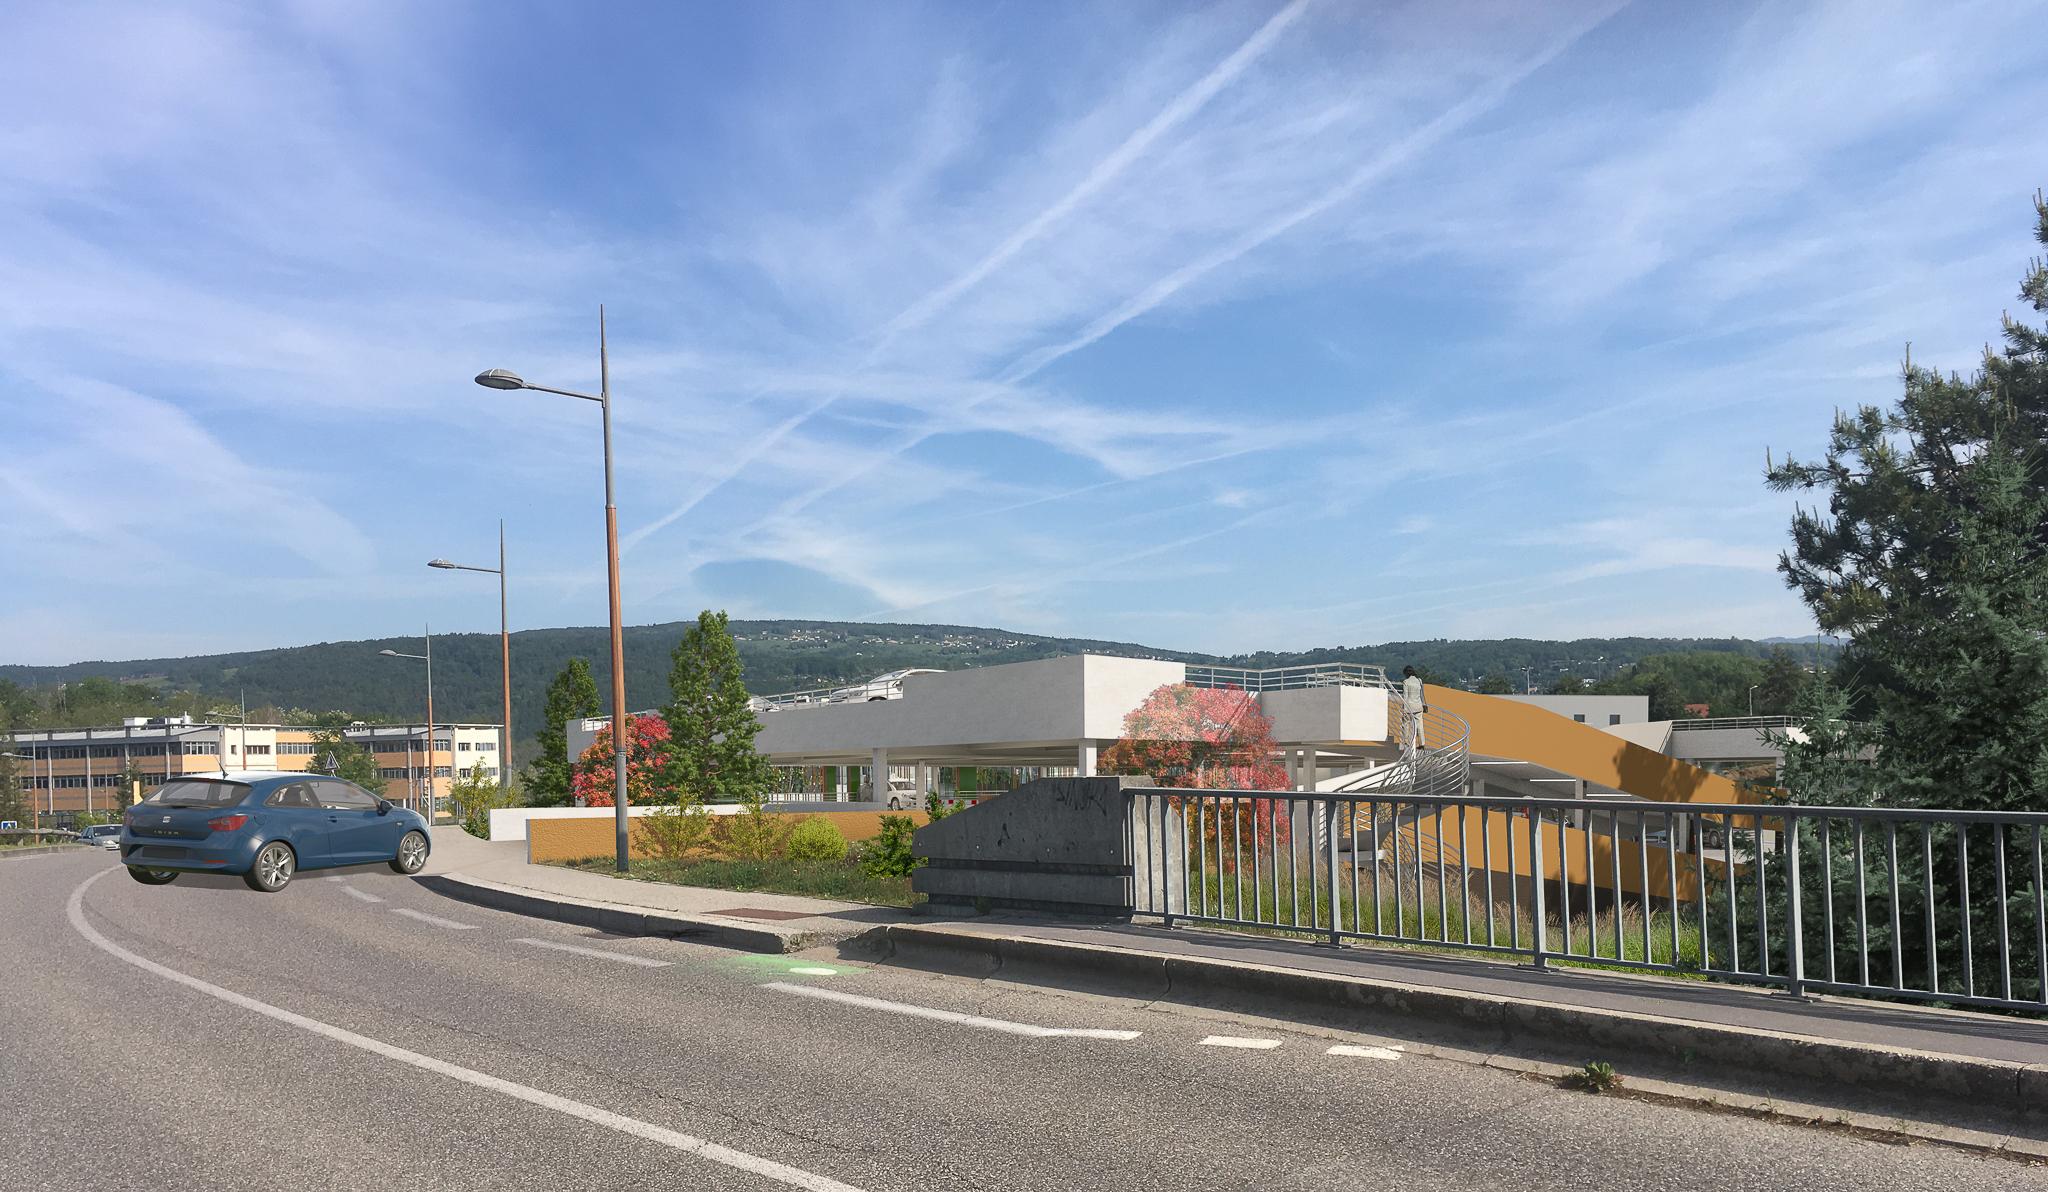 CH CHANGE annecy genevois cancerologie parking gagnepark GPK